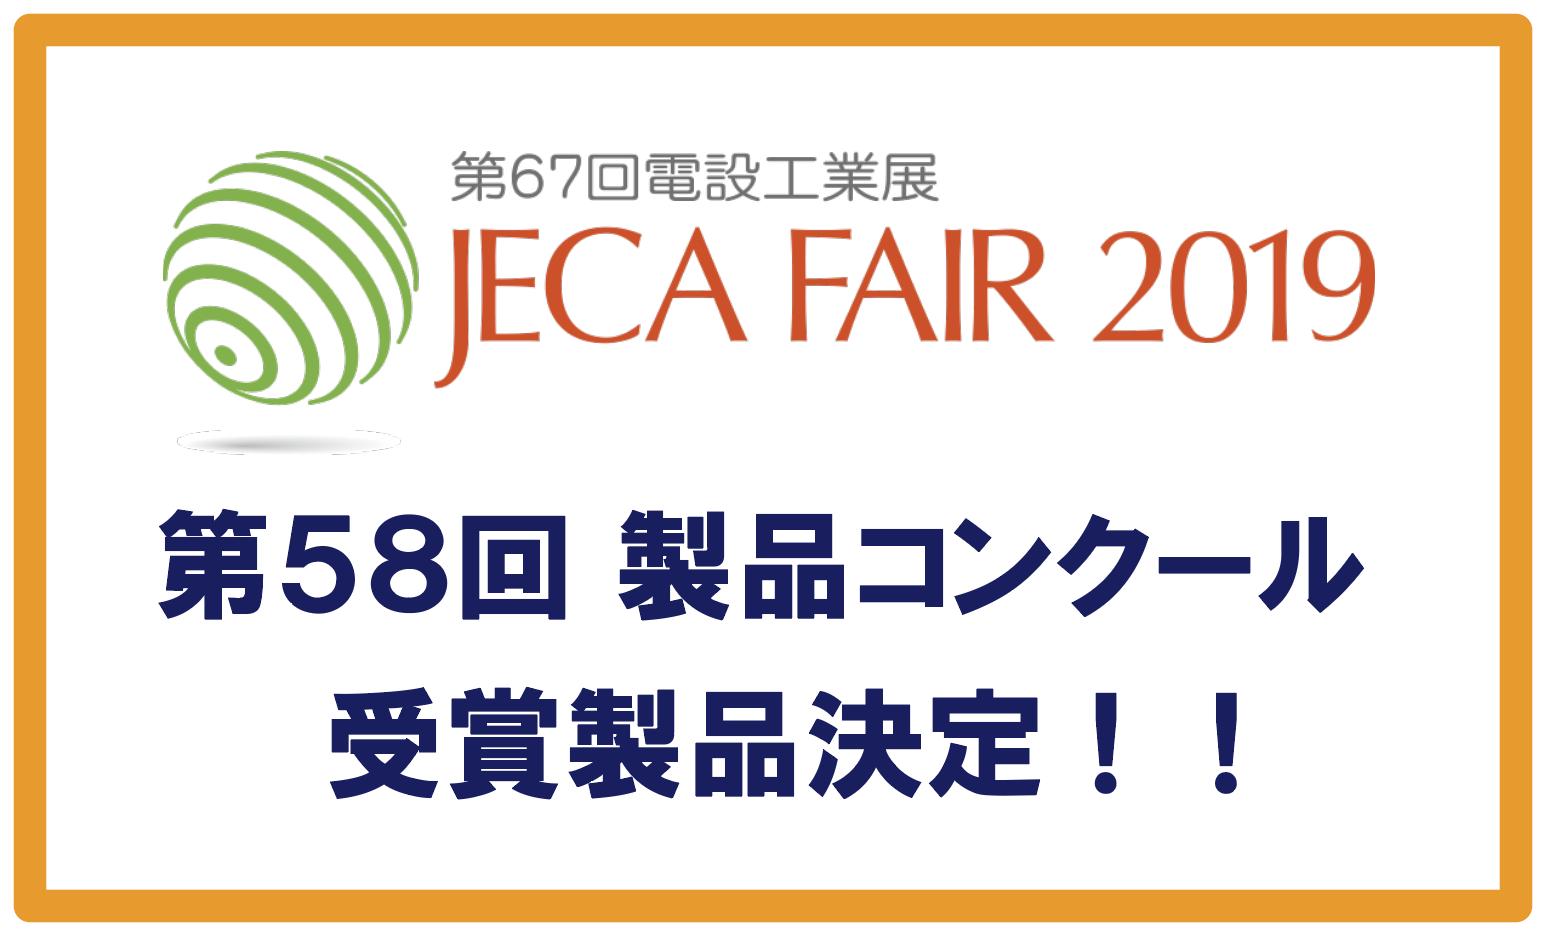 【JECA FAIR 2019】第58回 製品コンクール 受賞製品発表!!の画像